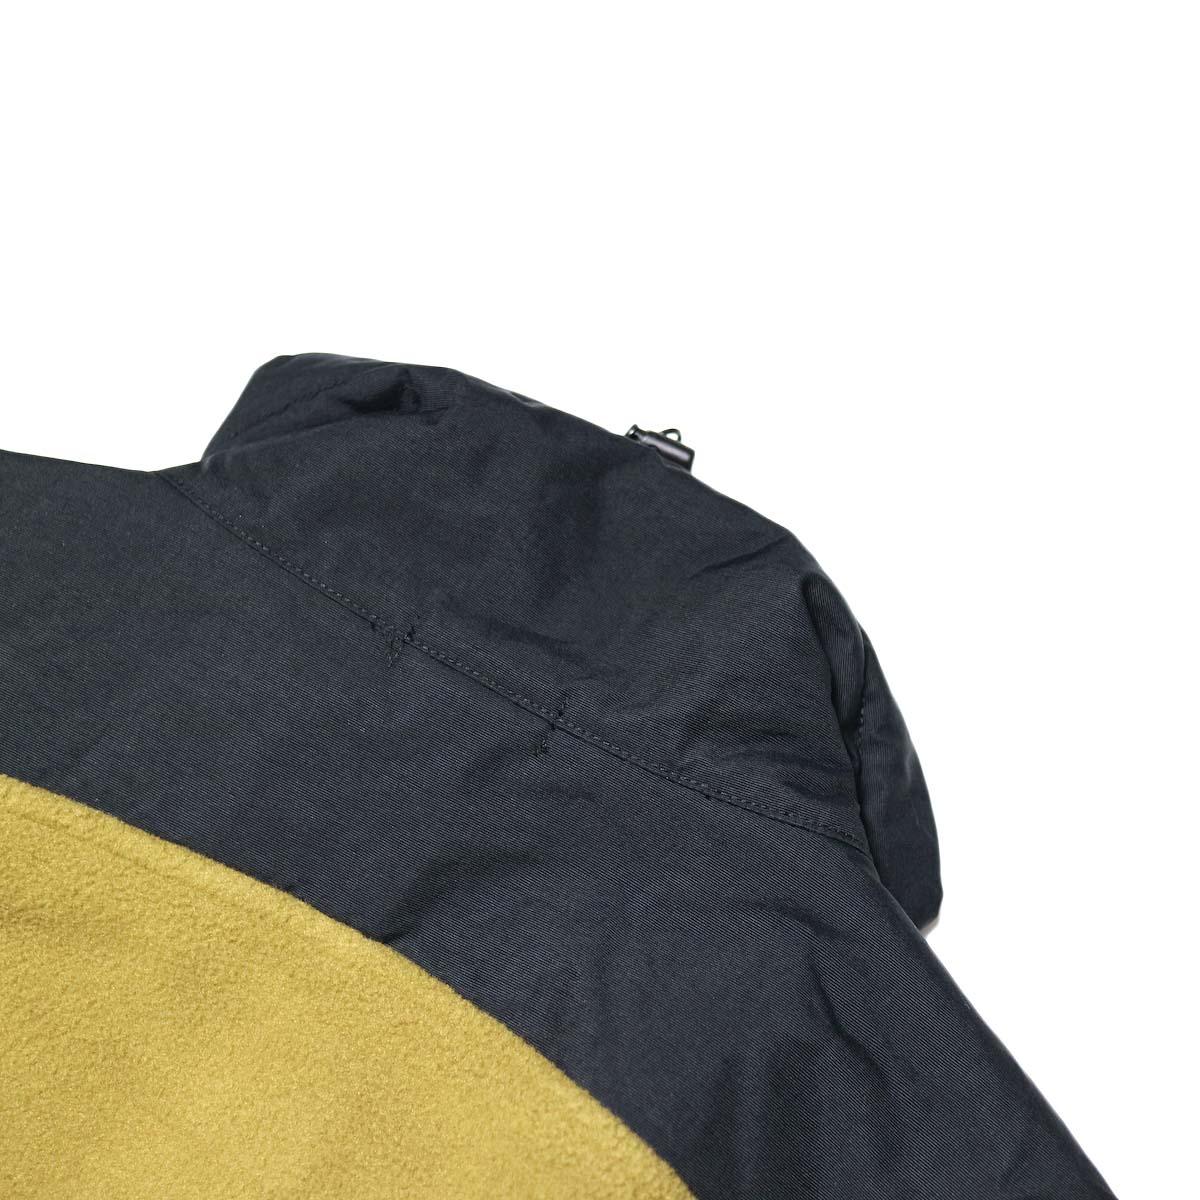 Marmot Histric Collection / Alpinist Tech Sweater (Coyote×Black)襟スピンドル